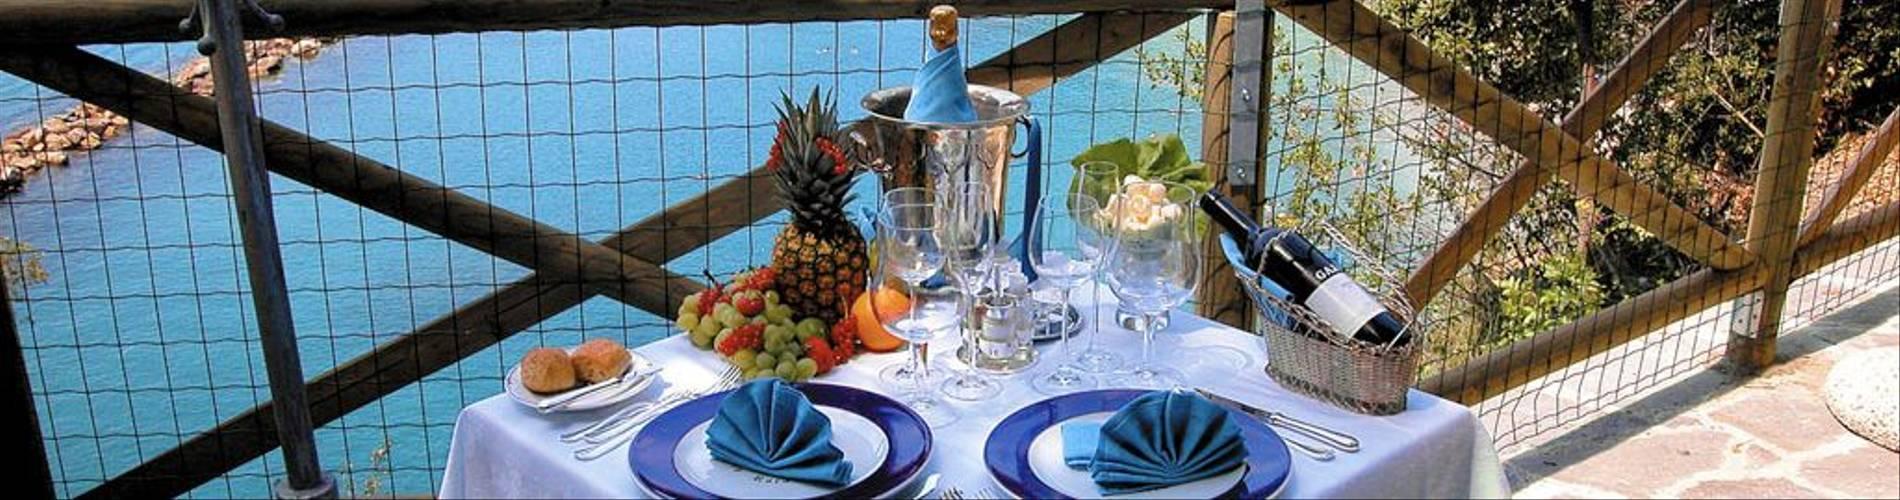 zoom-restaurant-monterosso-cinque-terre-6.jpg